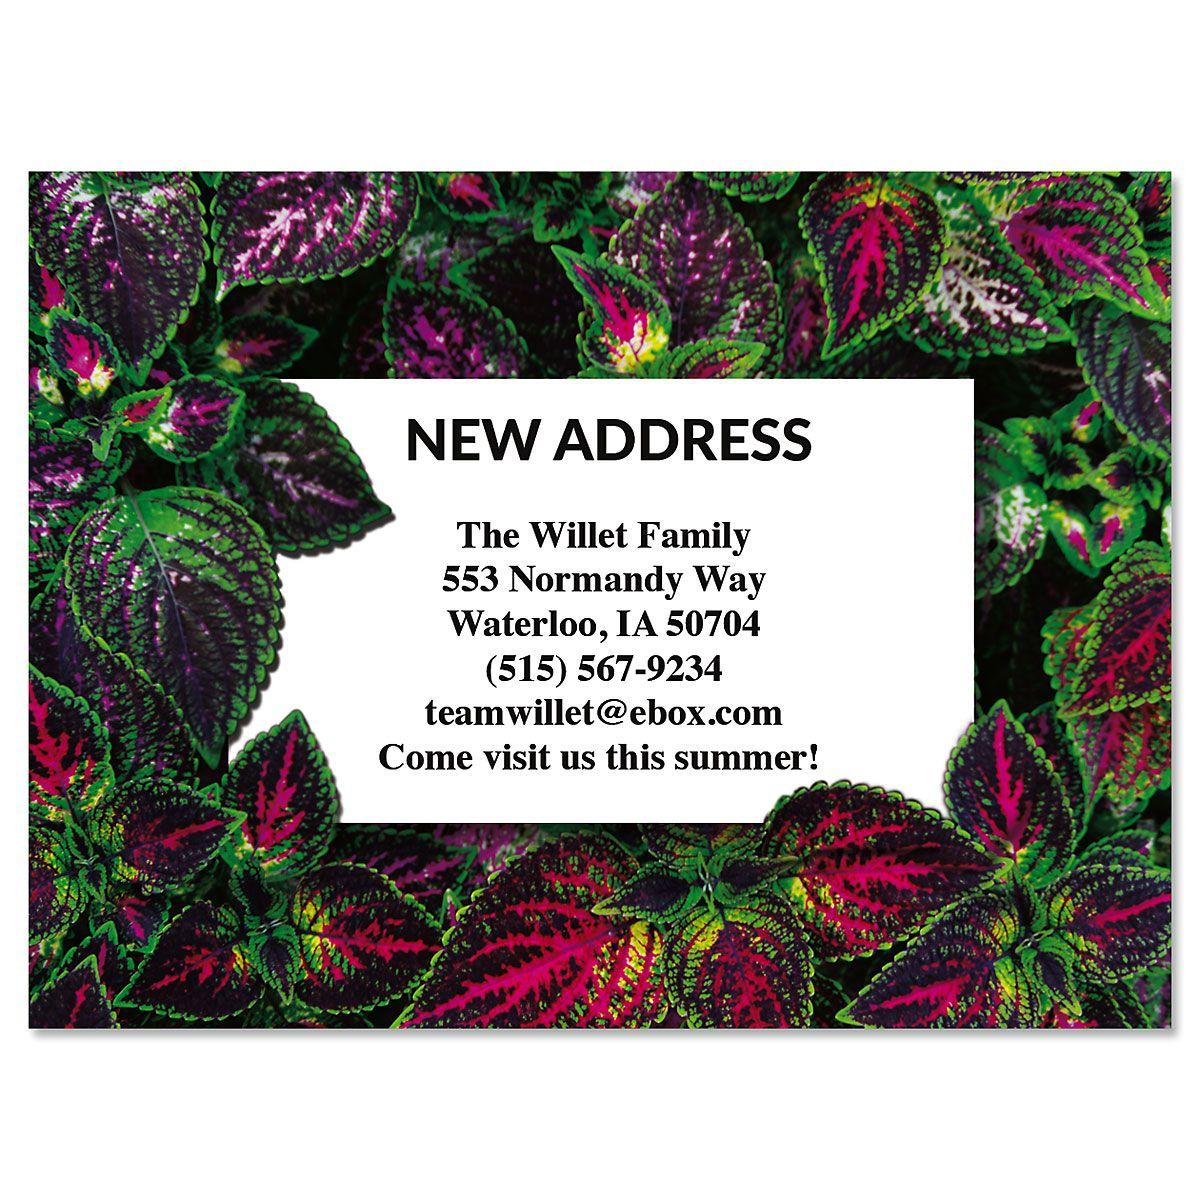 Newly Planted New Address Postcards